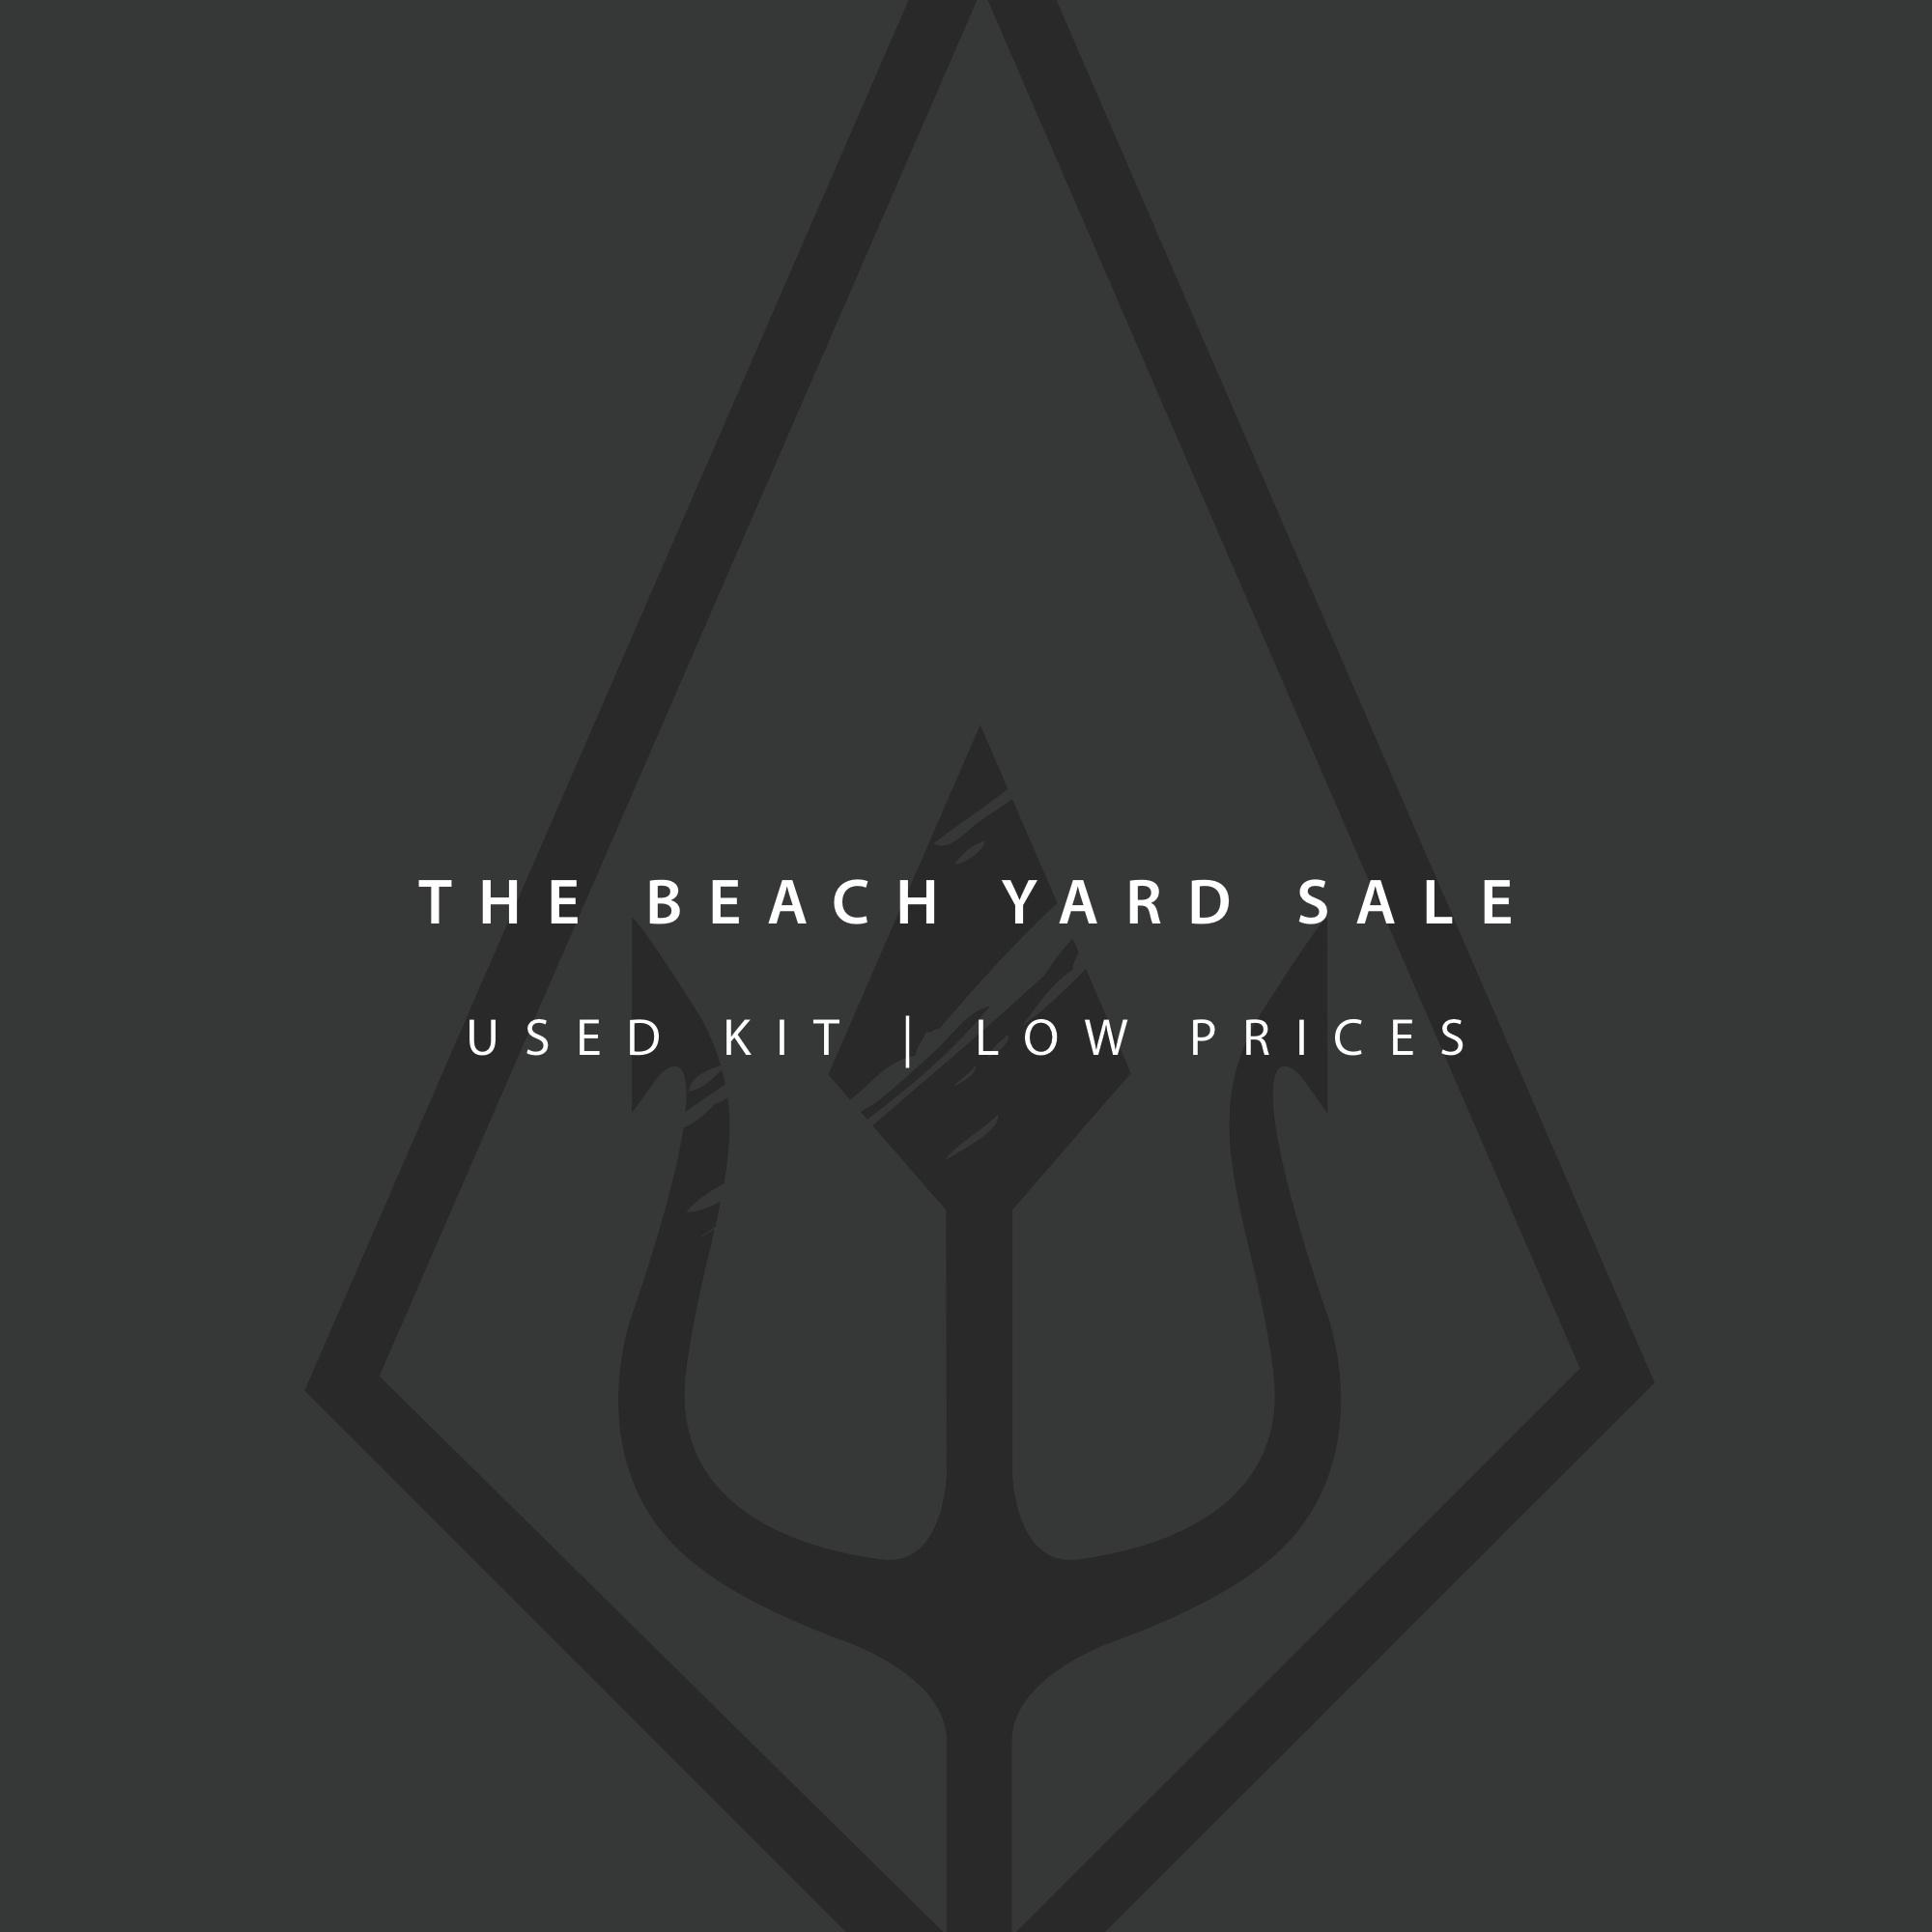 Yard_Sale_Sponsorable.jpg